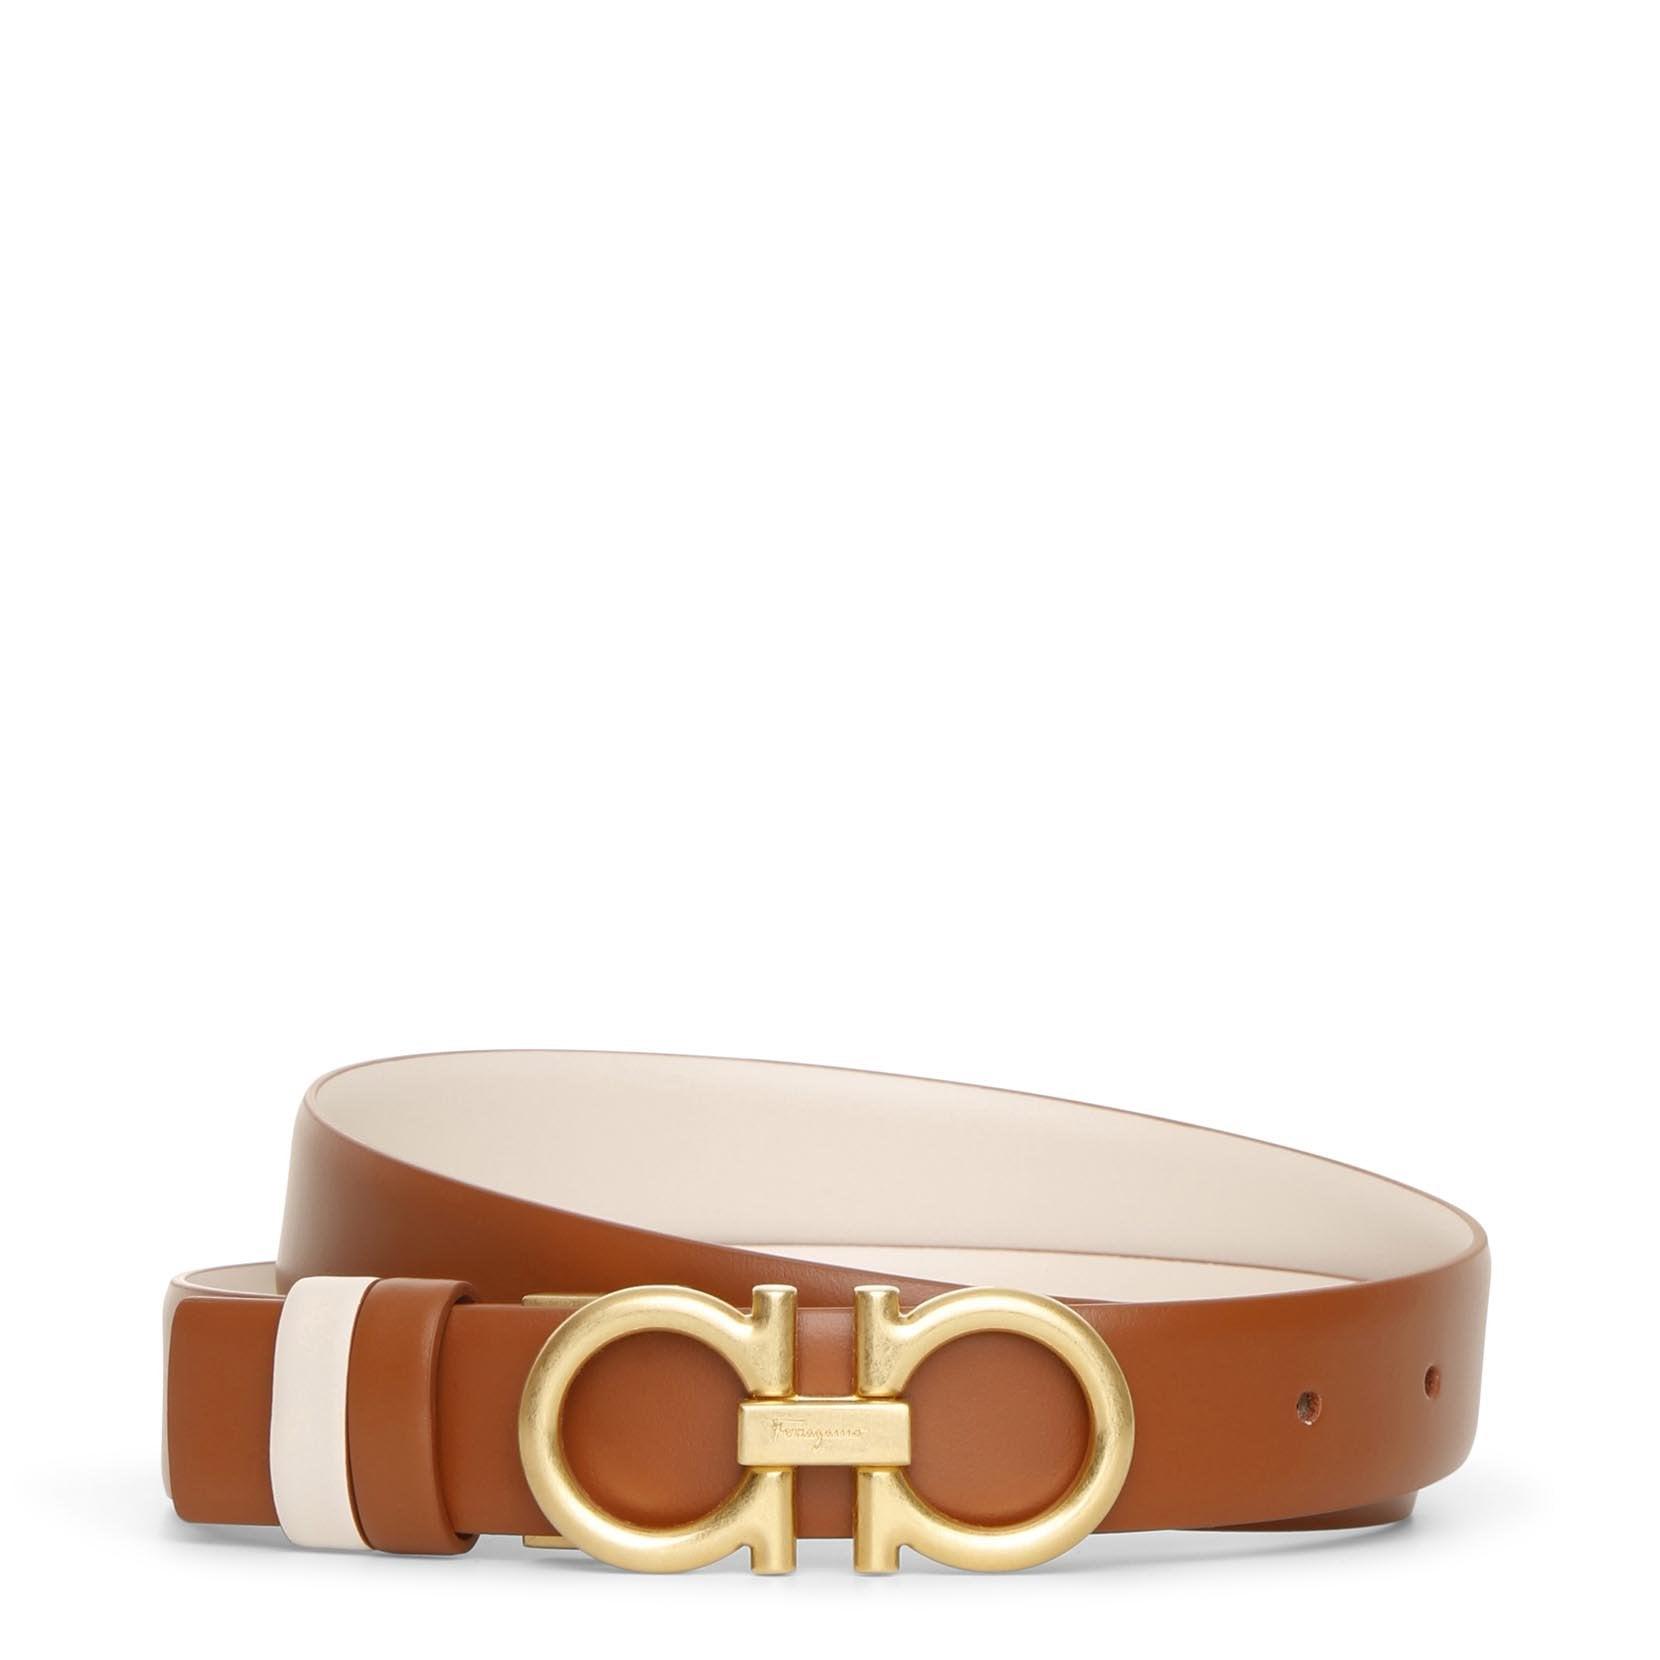 Salvatore Ferragamo Reversable and adjustable tan cream leather belt  - brown/beige - female - Size: 95